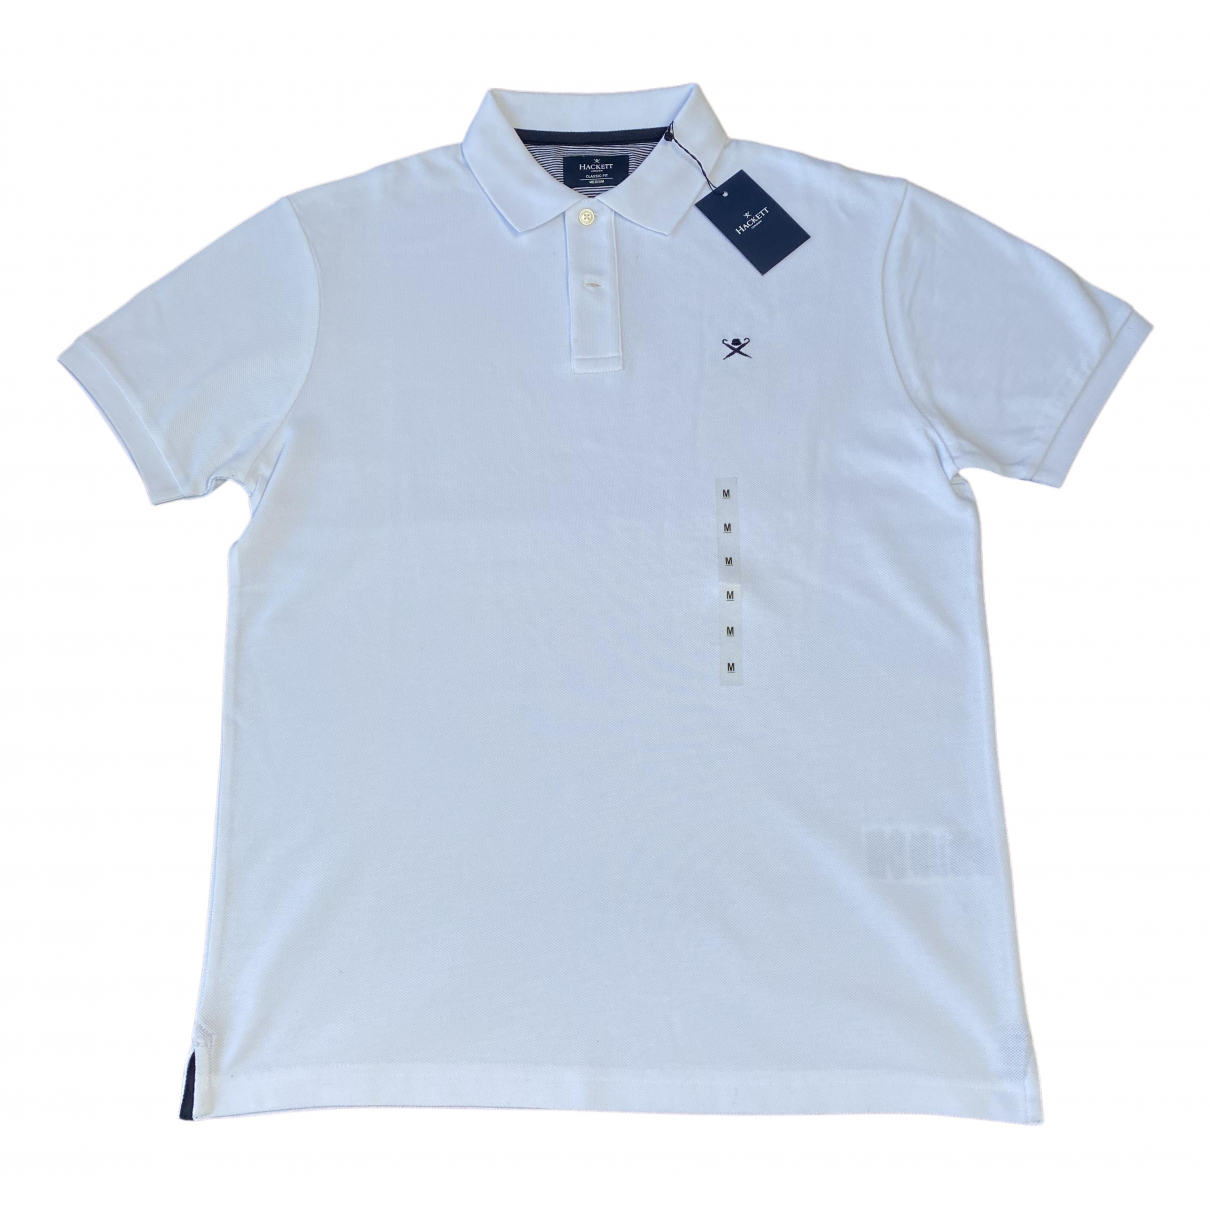 Hackett London \N Poloshirts in  Weiss Baumwolle